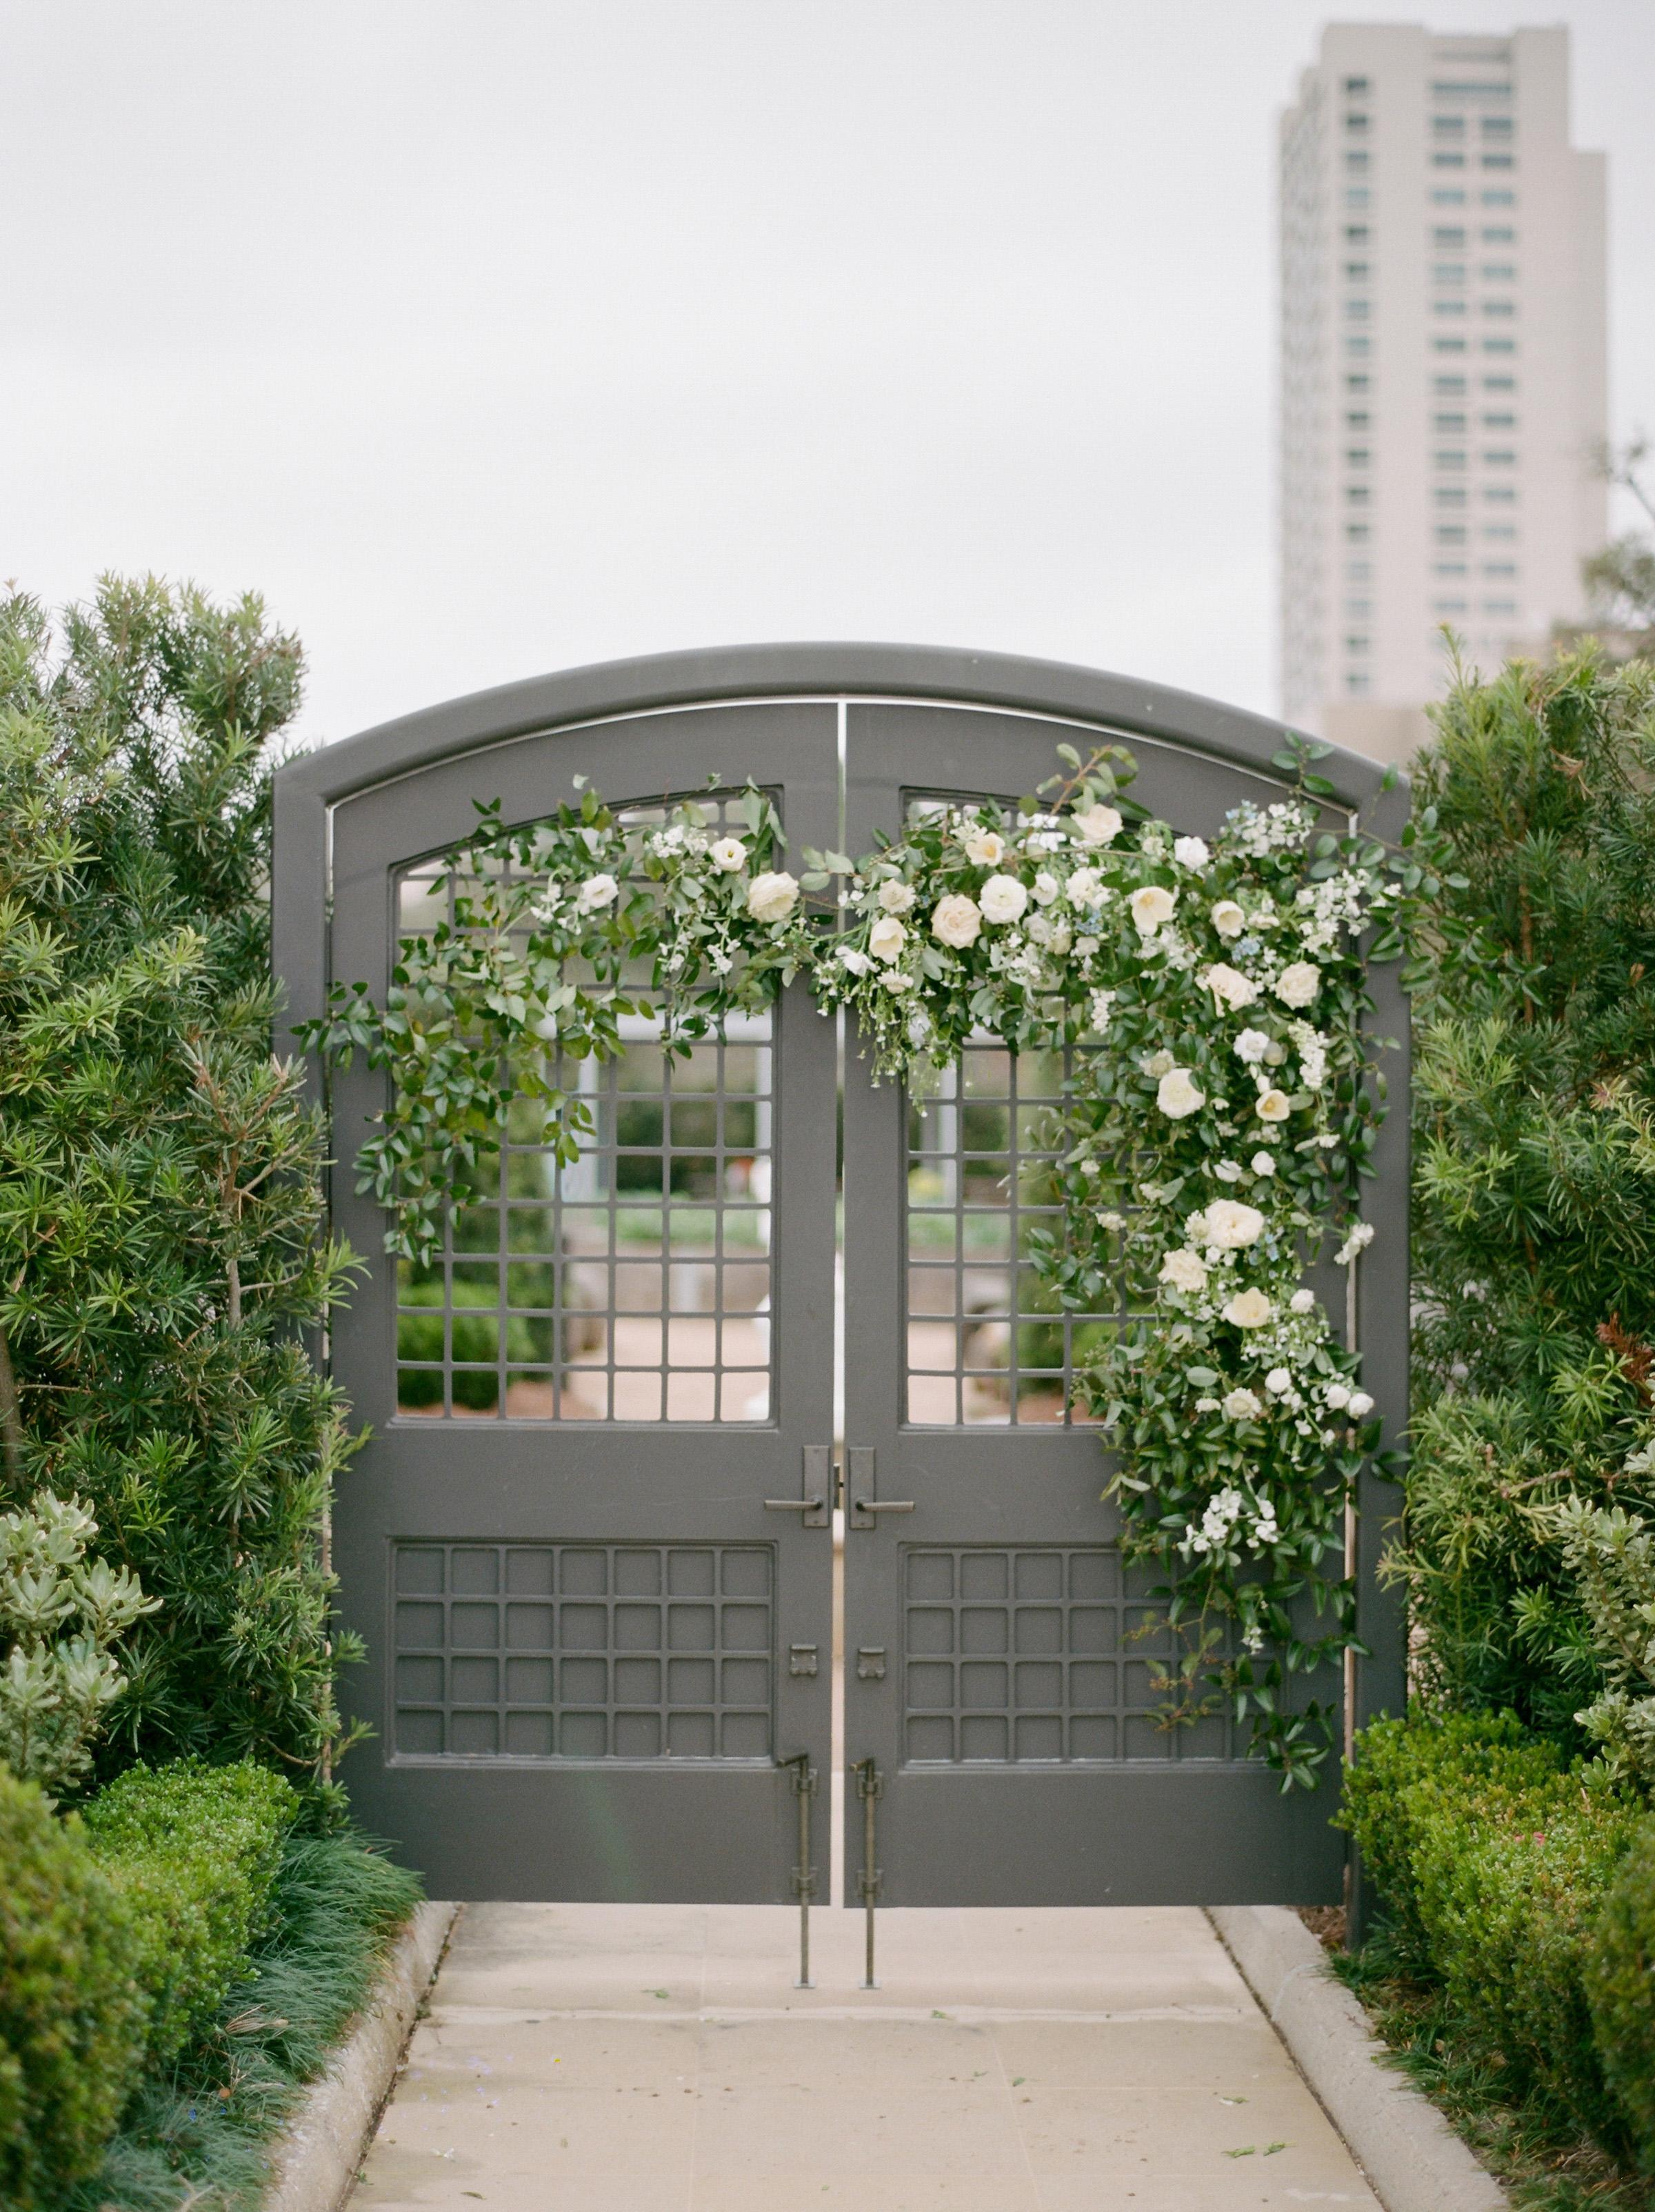 McGovern-Centennial-Gardens-Houston-Texas-Wedding-Venue-Josh-Dana-Fernandez-Photography-Film-Destination-Fine-Art-Luxury-Top-Best-Austin-Dallas-Magnolia-Rouge-Jennifer-Laura-Design-204.jpg